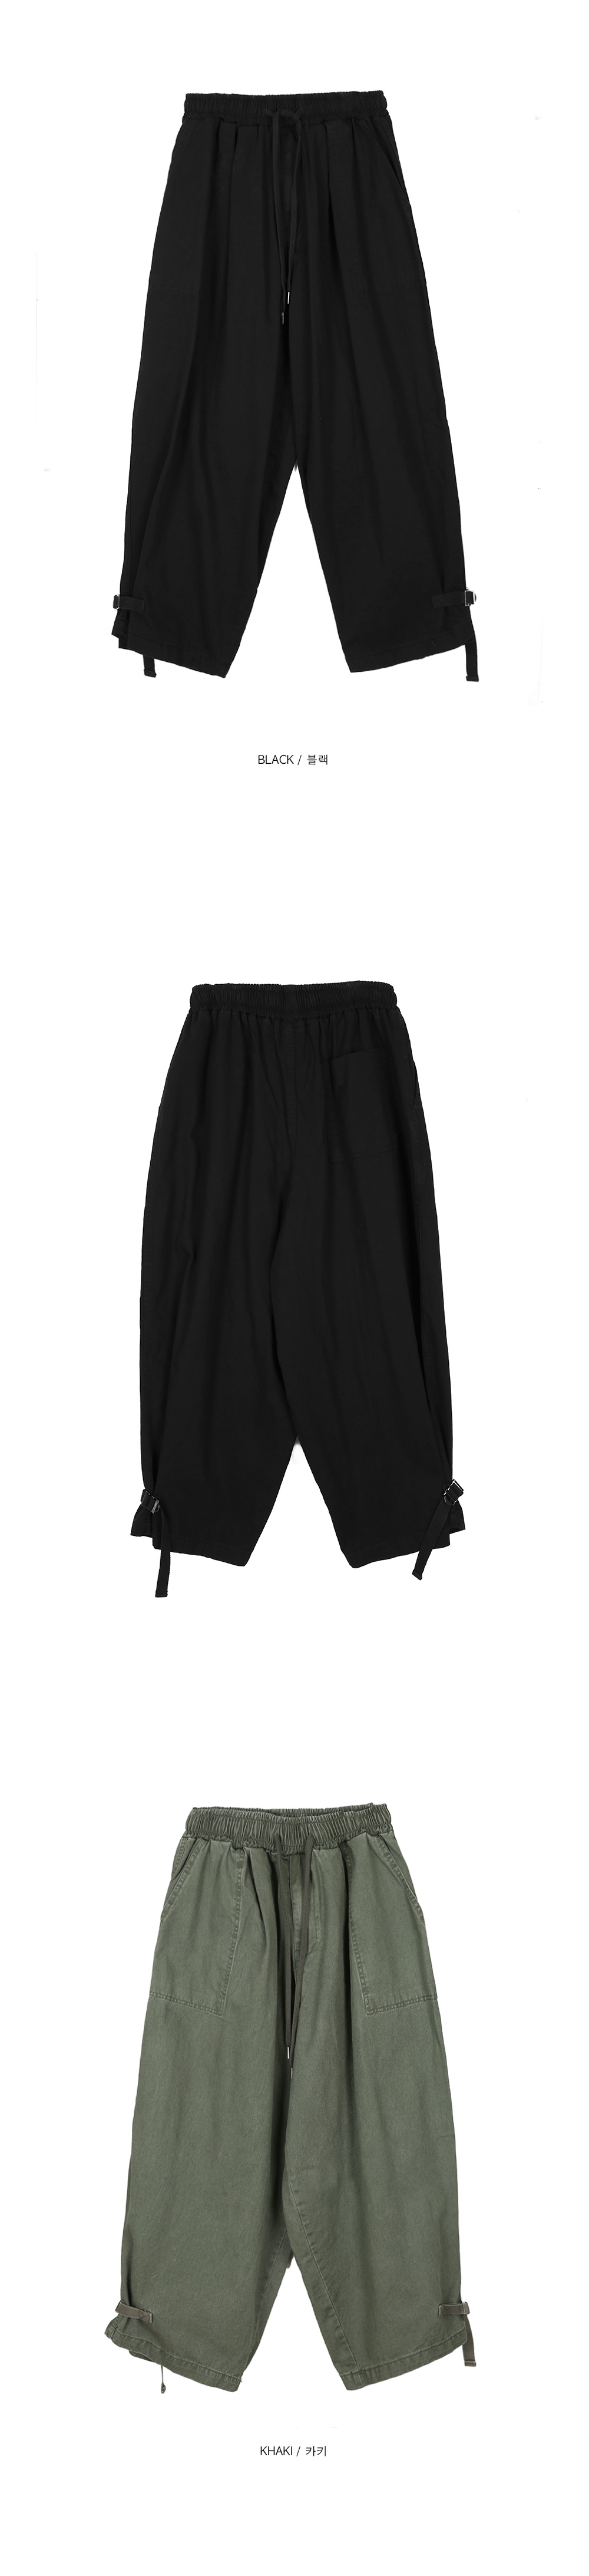 buckle jogger balloon pants (2 color) - men